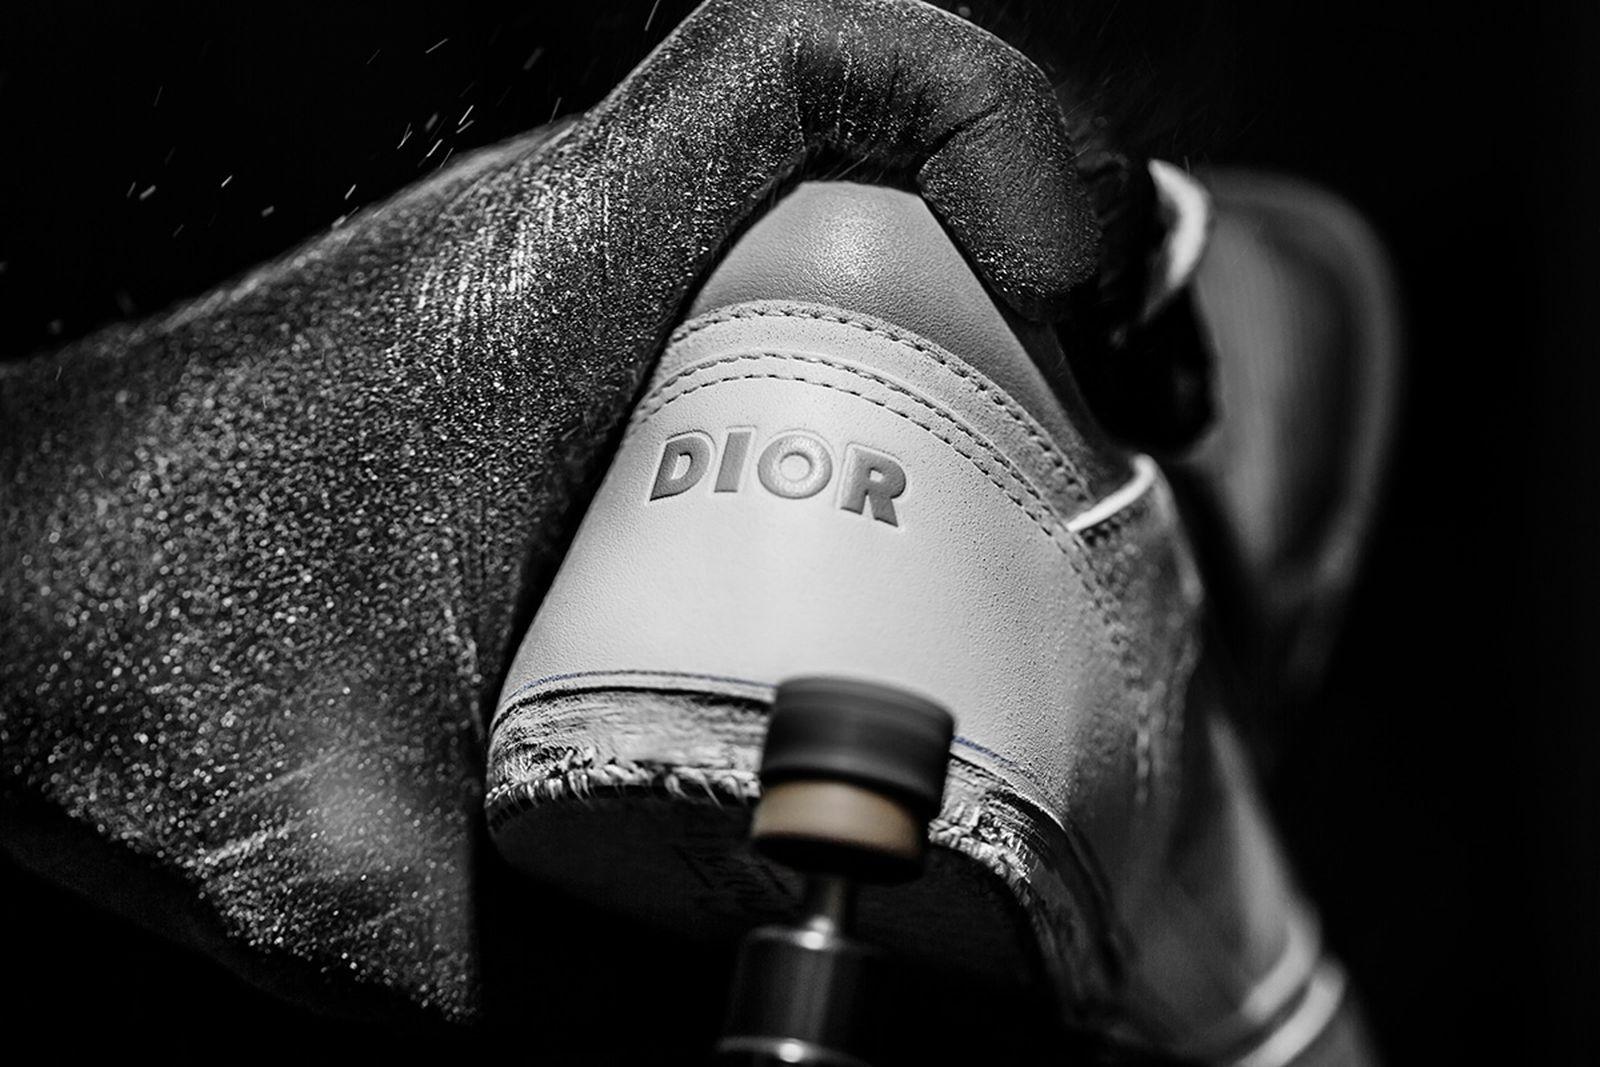 dior-b27-sneaker-release-date-price-new-01